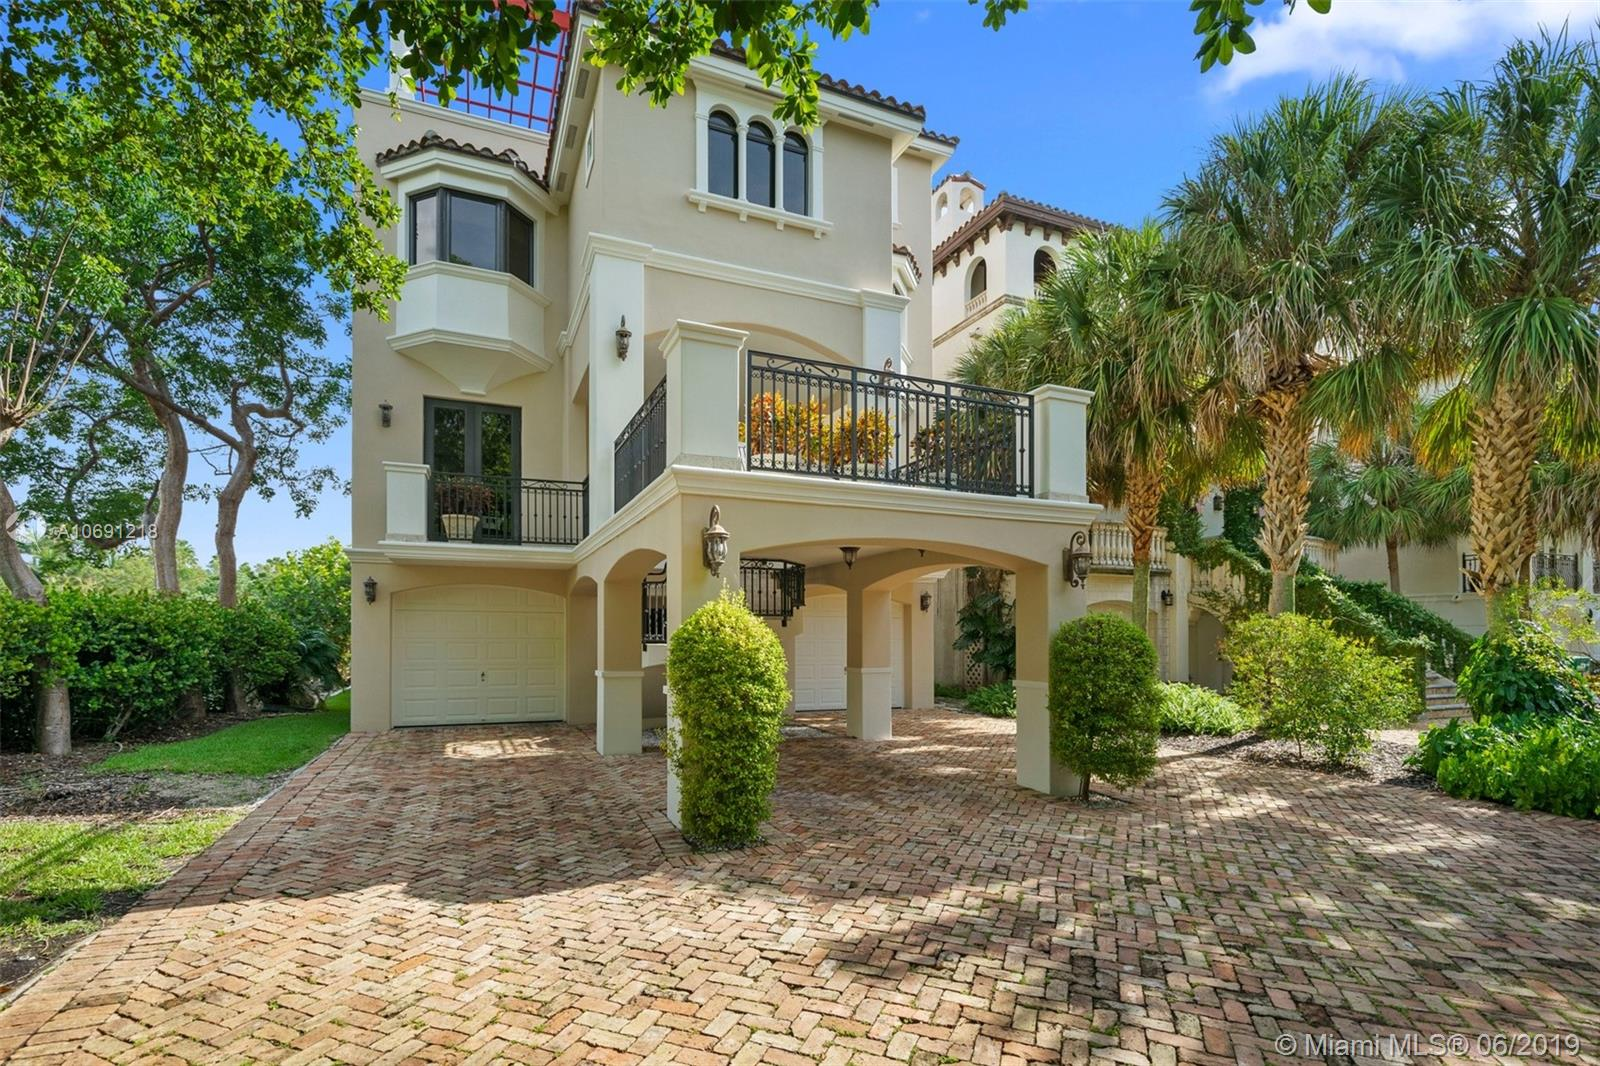 5860 Paradise Point Dr, Palmetto Bay, FL 33157